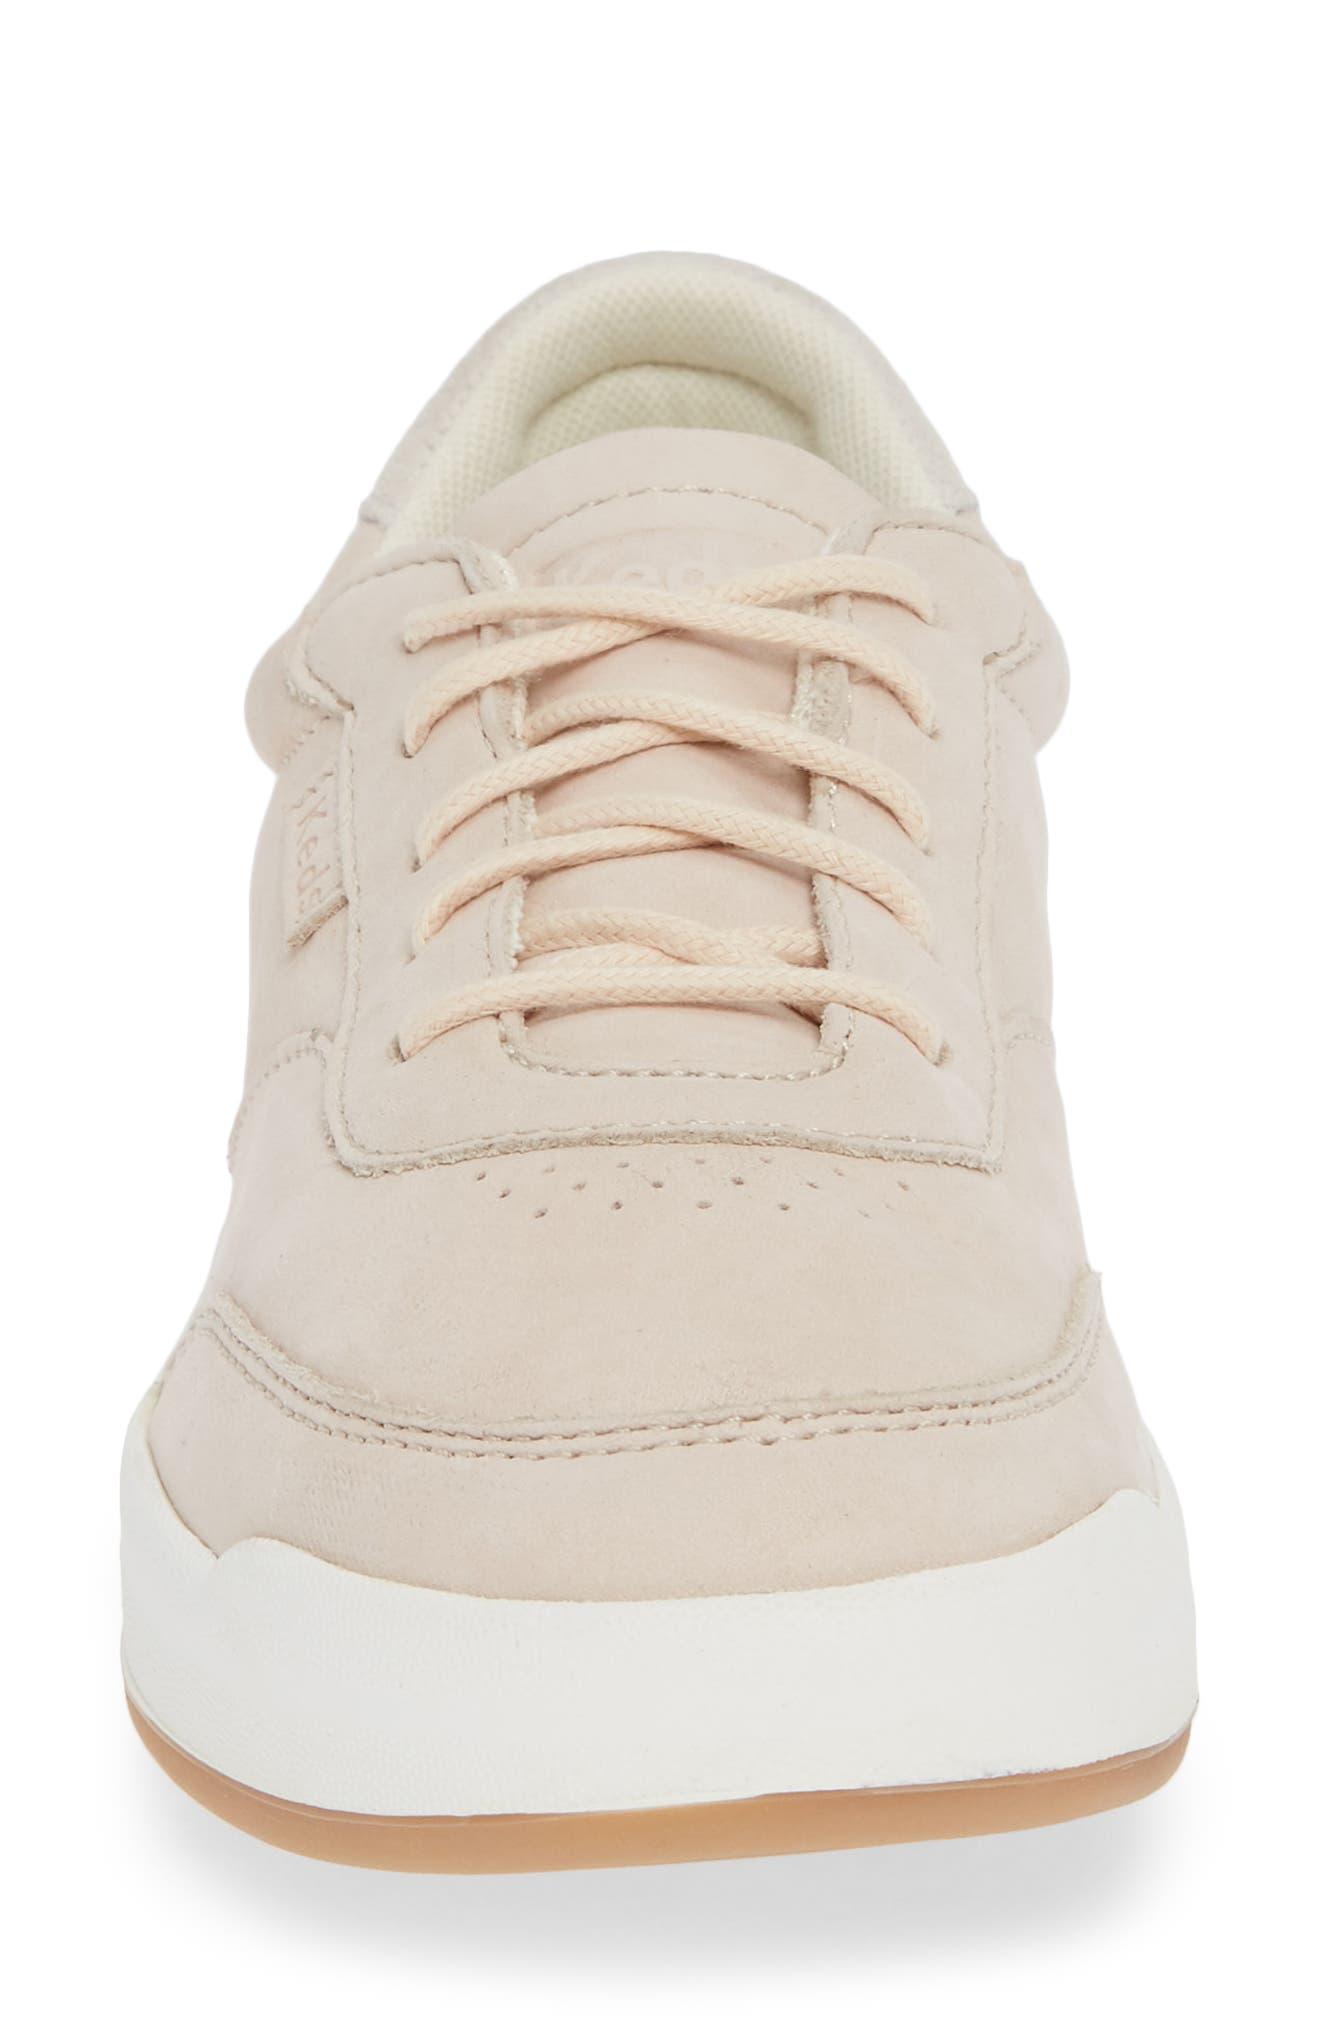 Match Point Sneaker,                             Alternate thumbnail 4, color,                             685